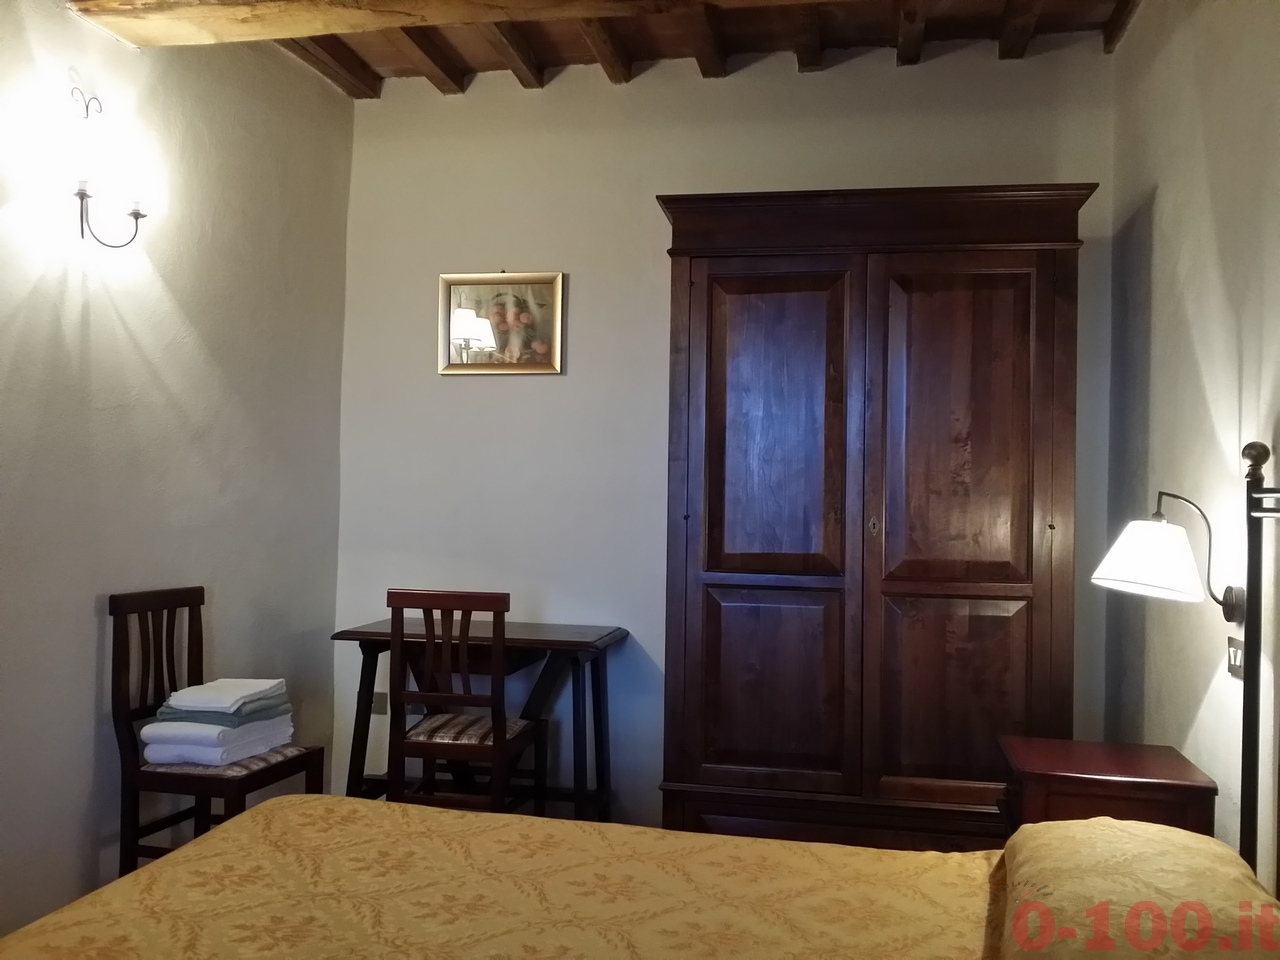 santa-felicita-paterna-turismo-umbria-agriturismo-vacanza-country-house-0-100_0-1005